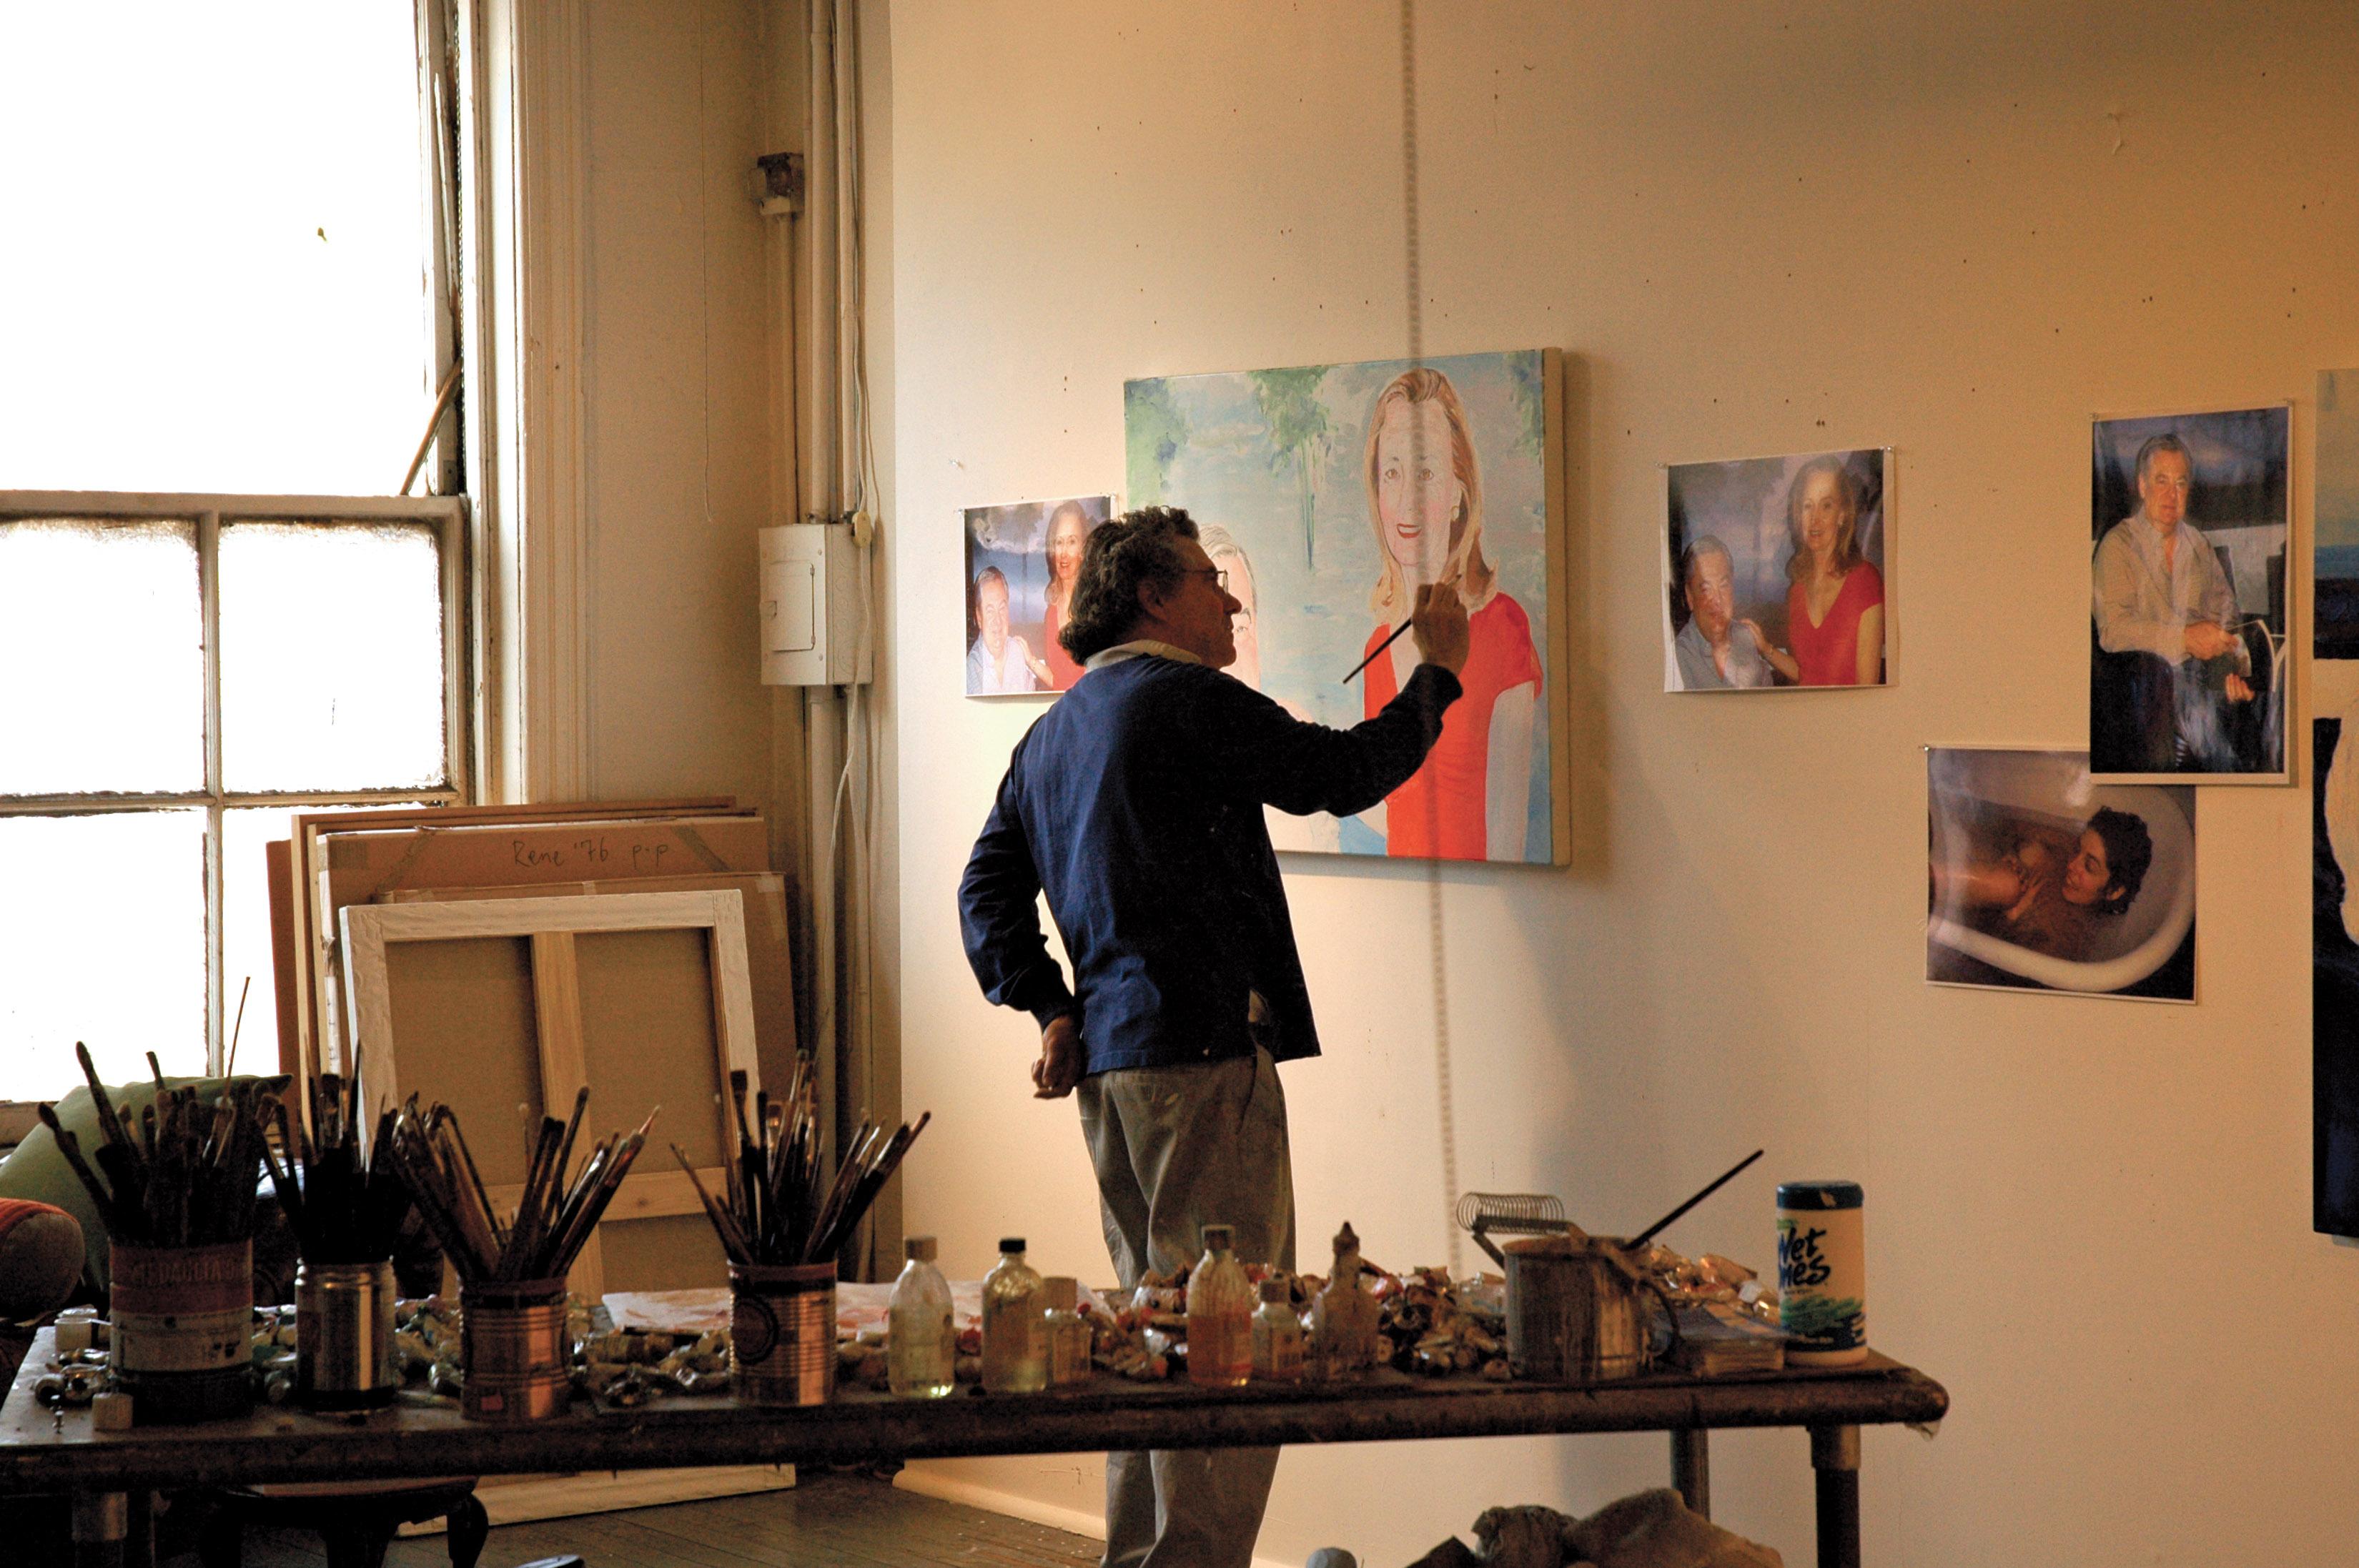 Billy Sullivan, The Bowery 2007